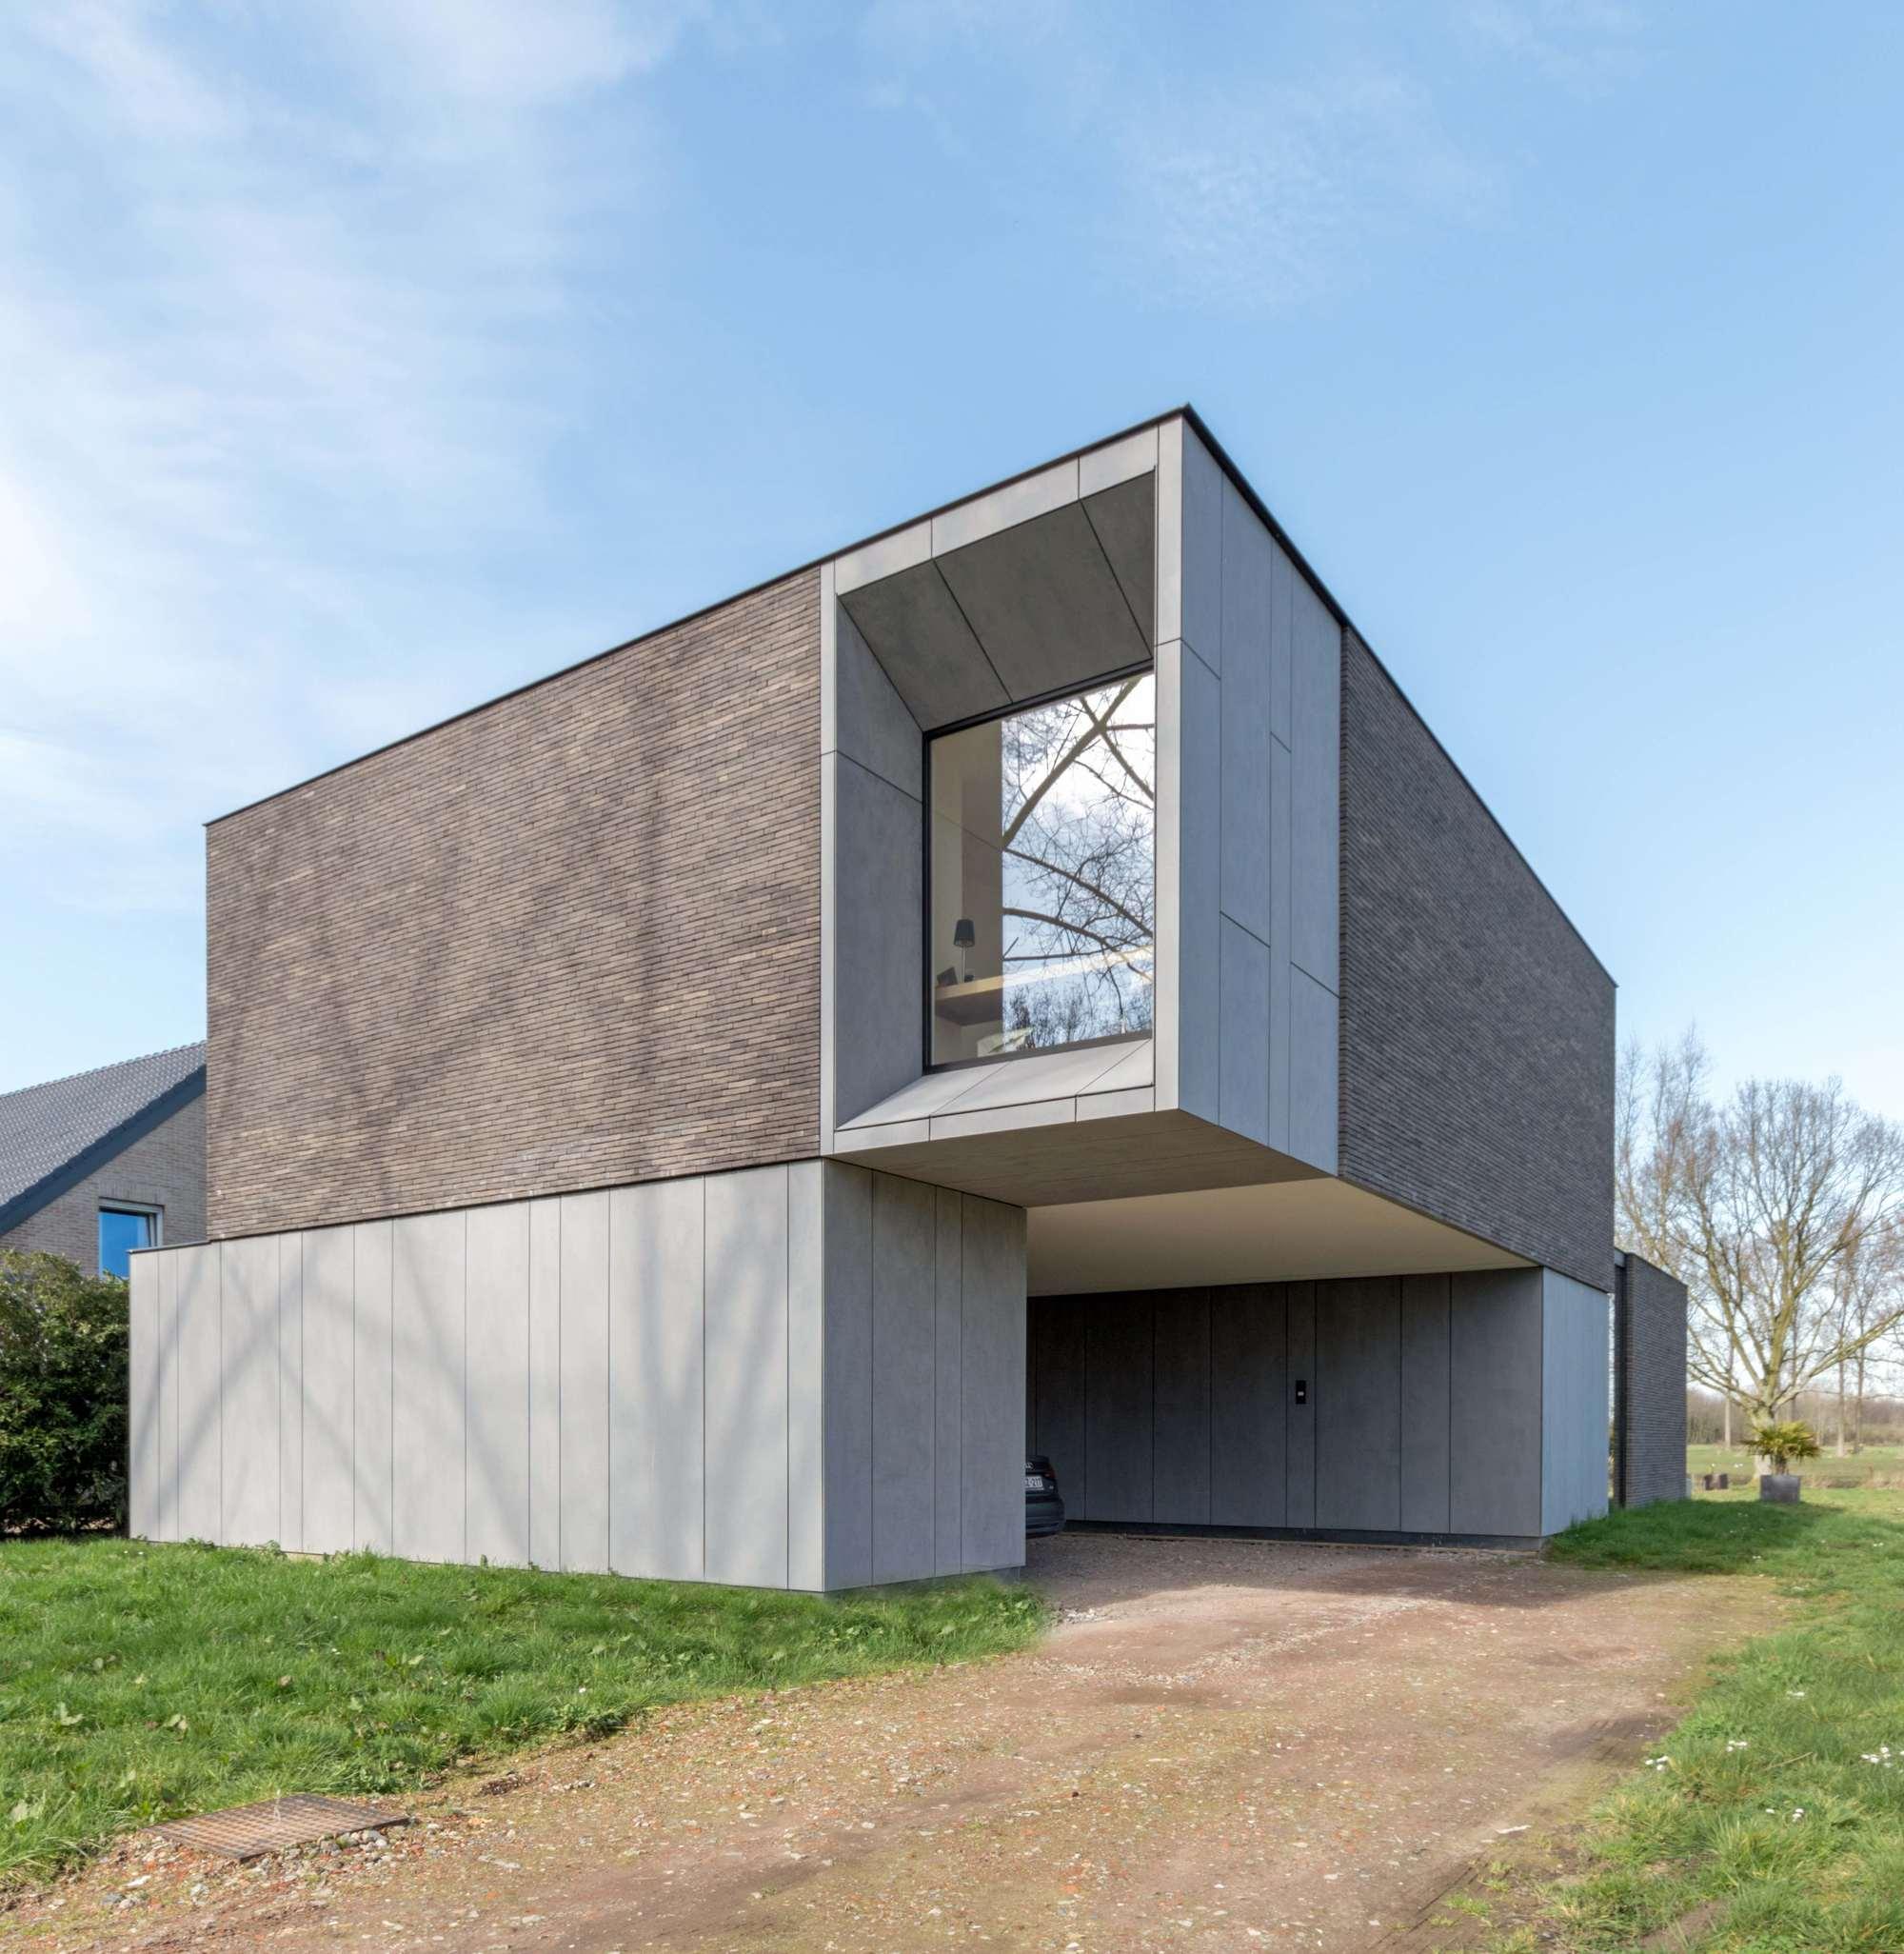 Architecture Home Modern House Design: DE BAEDTS House / Architektuuburo Dirk Hulpia